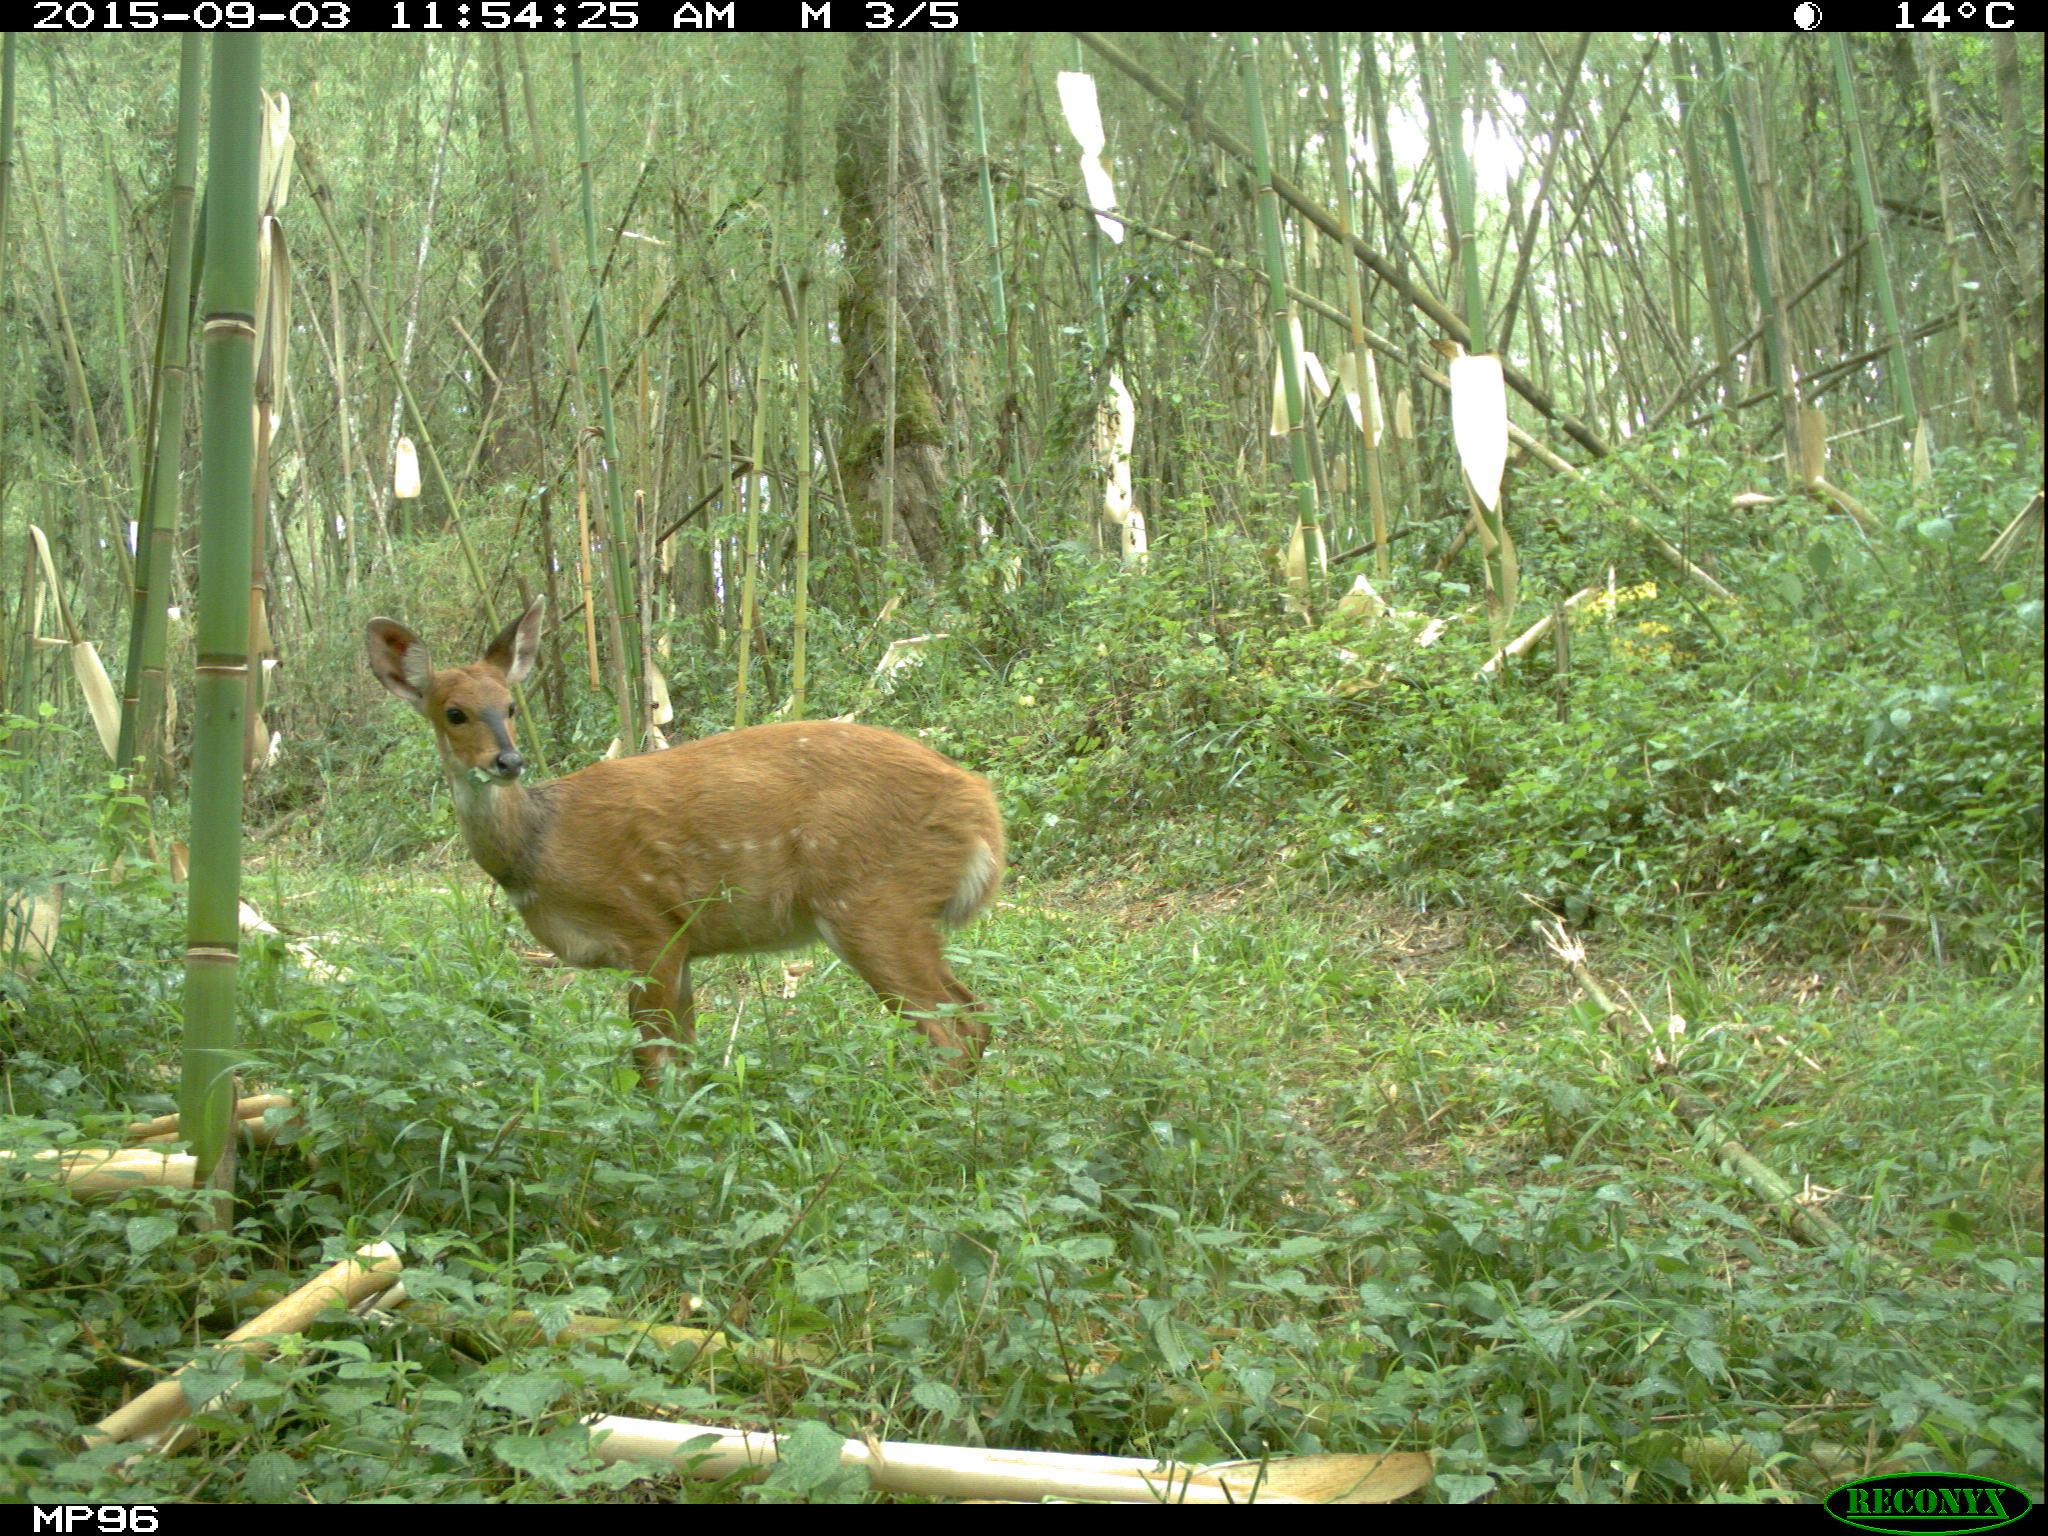 Bushbuck – A Striking Antelope